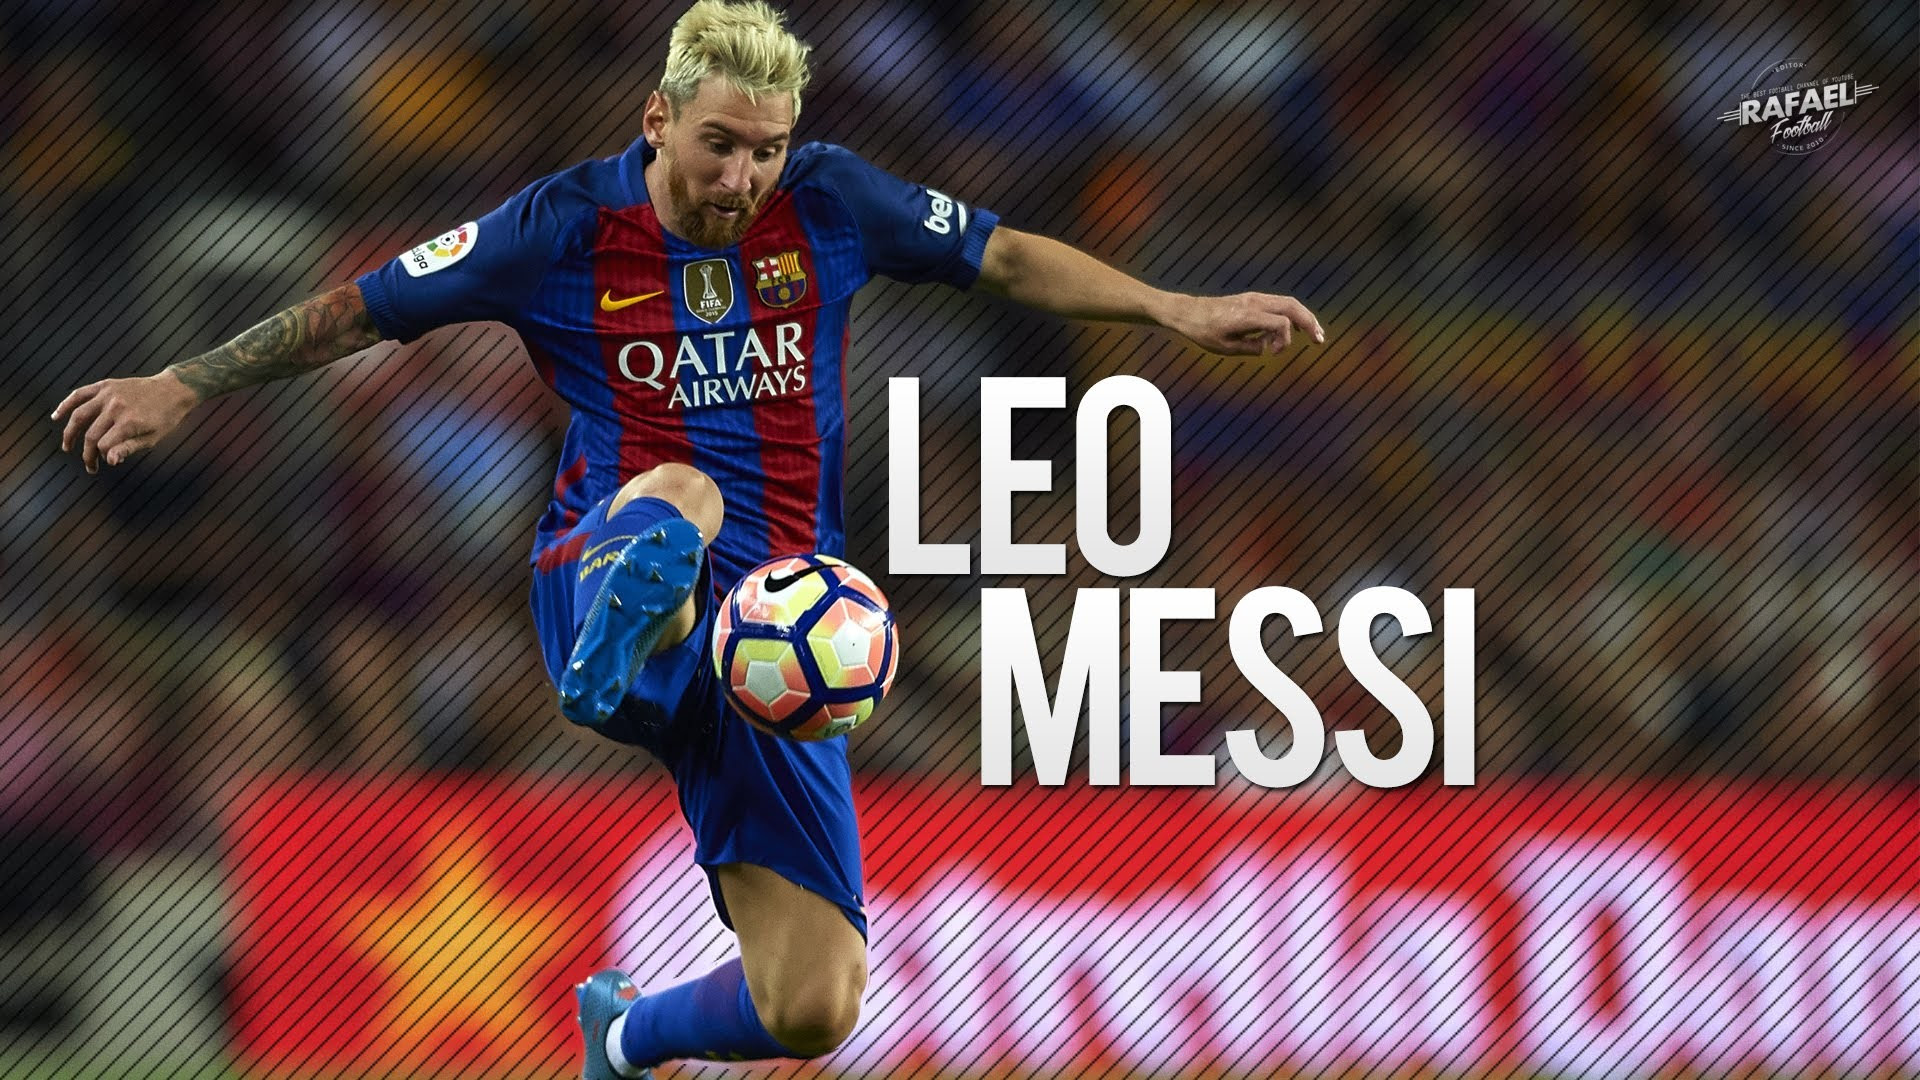 Lionel Messi Wallpaper HD 2018 (77+ images)